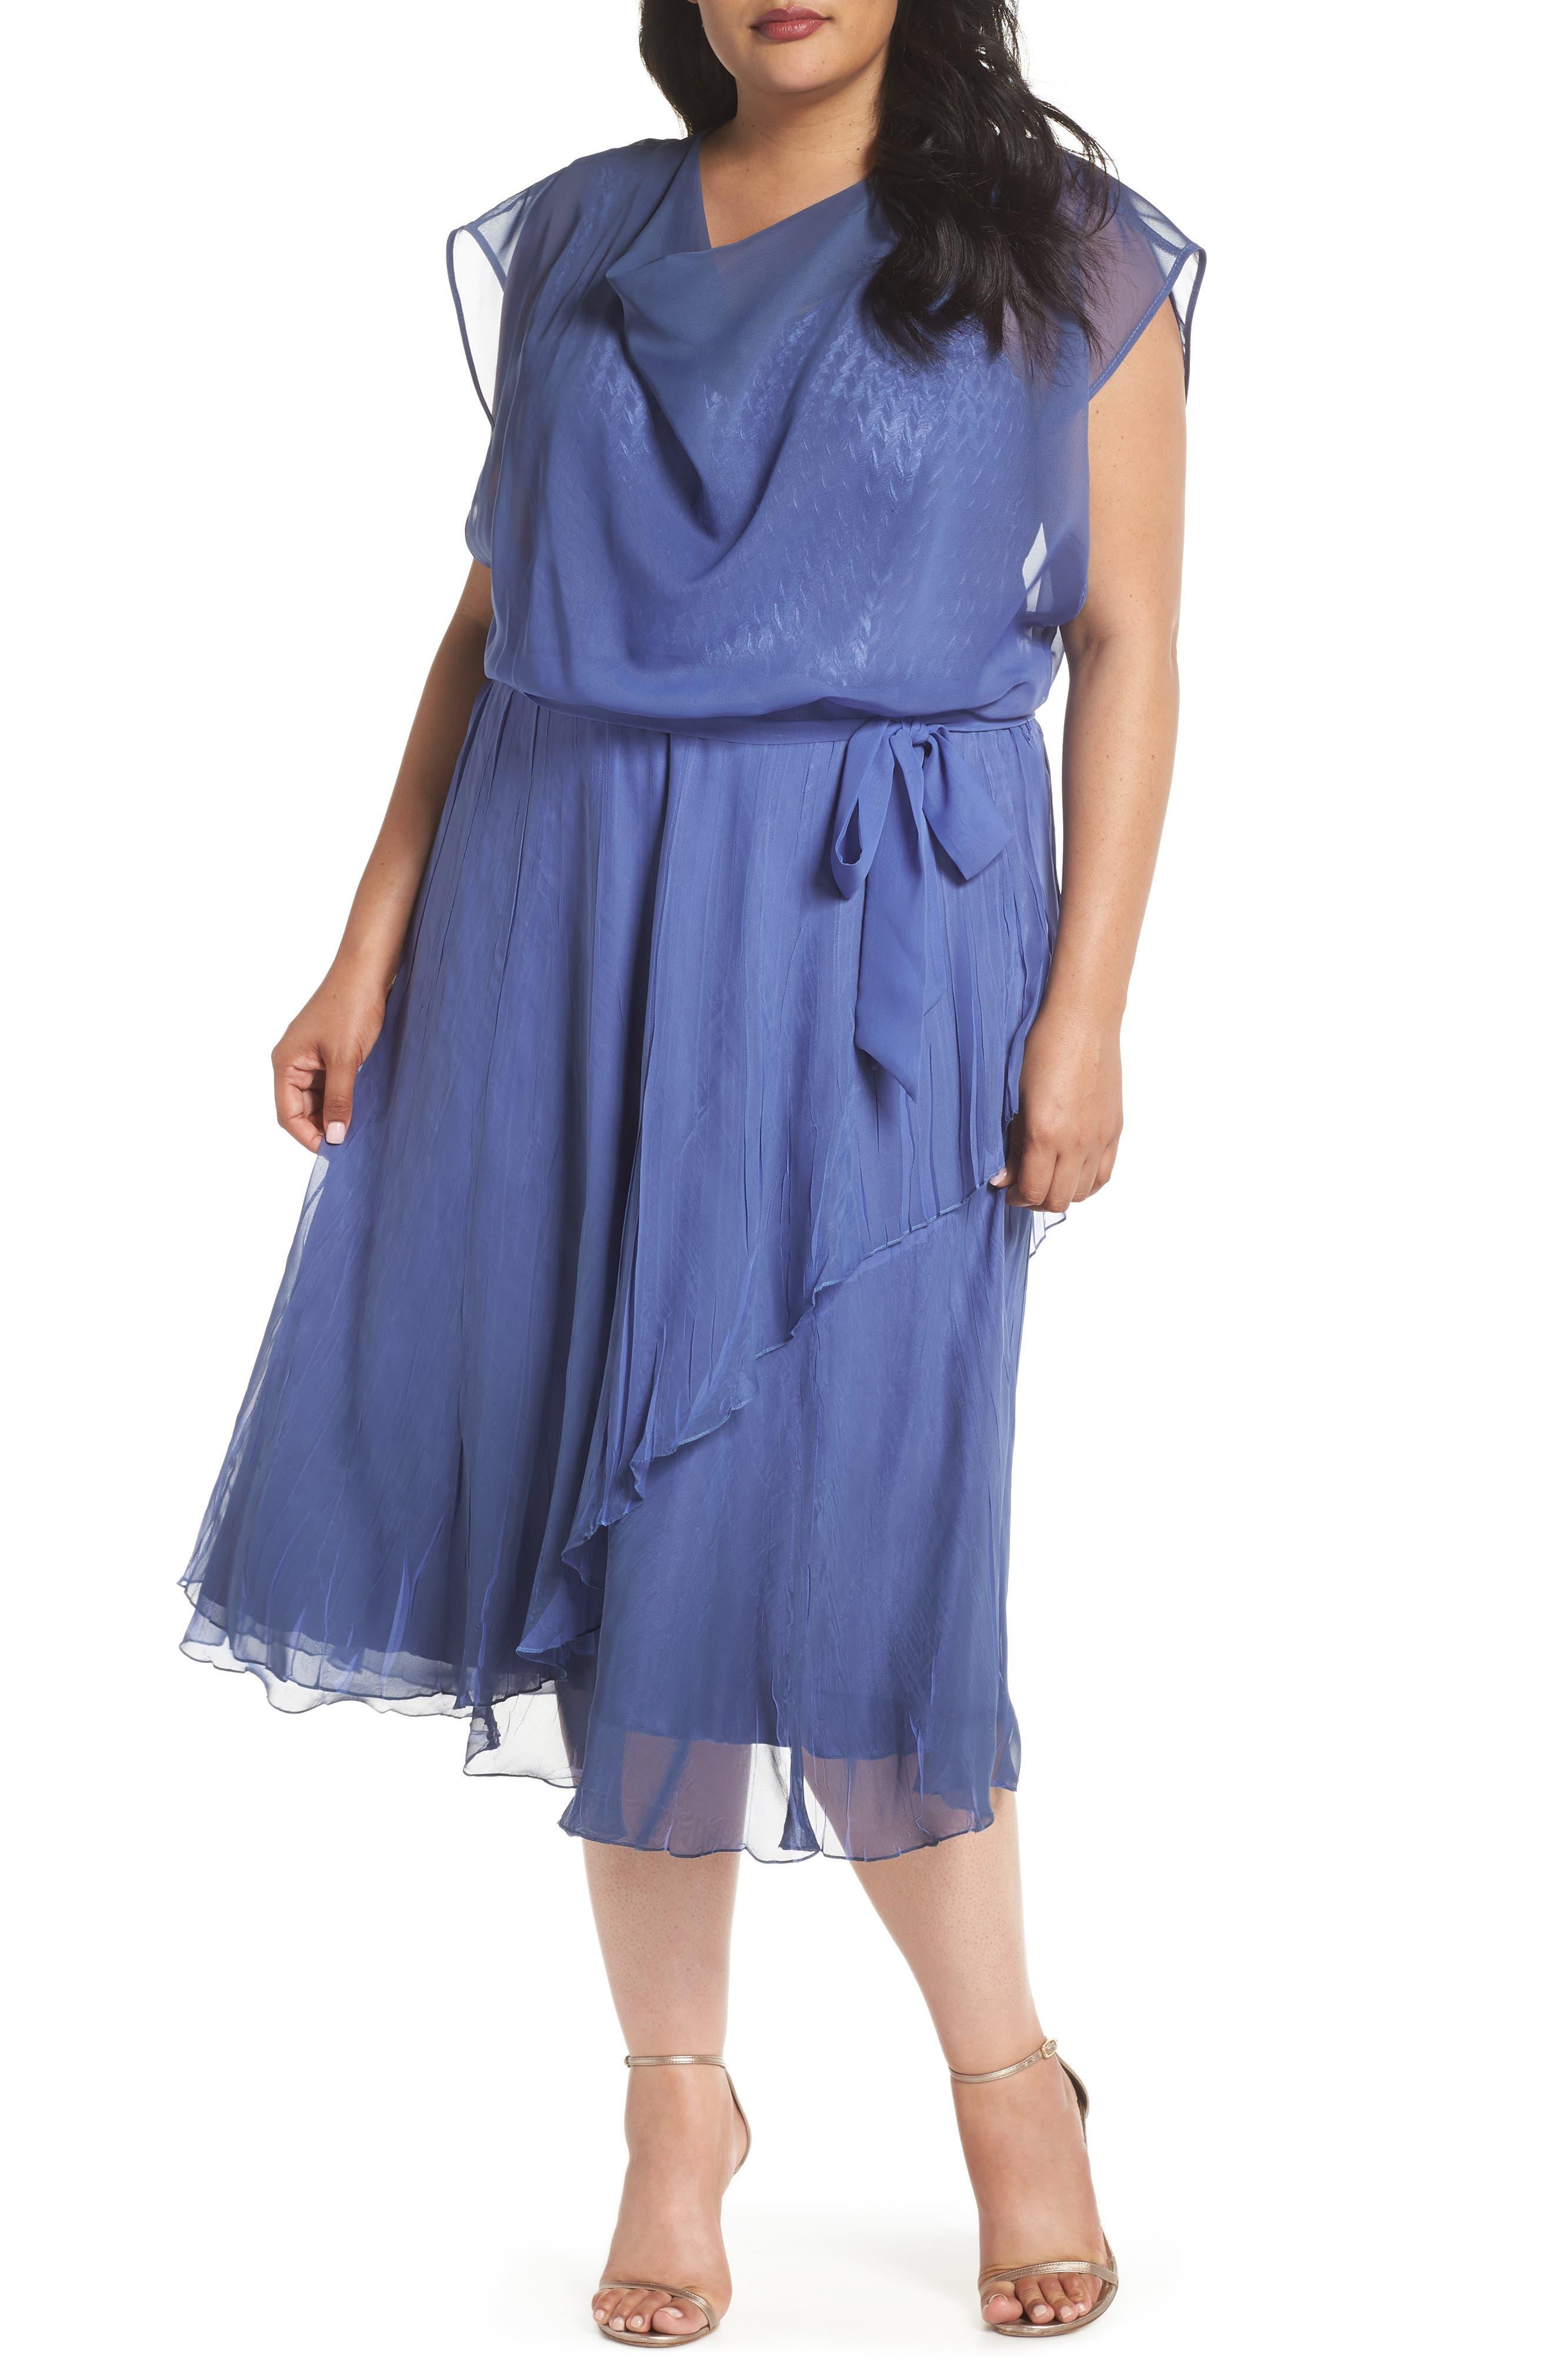 Charmeuse & Chiffon Blouson Dress,                         Main,                         color, Fregatta Blue Ombre